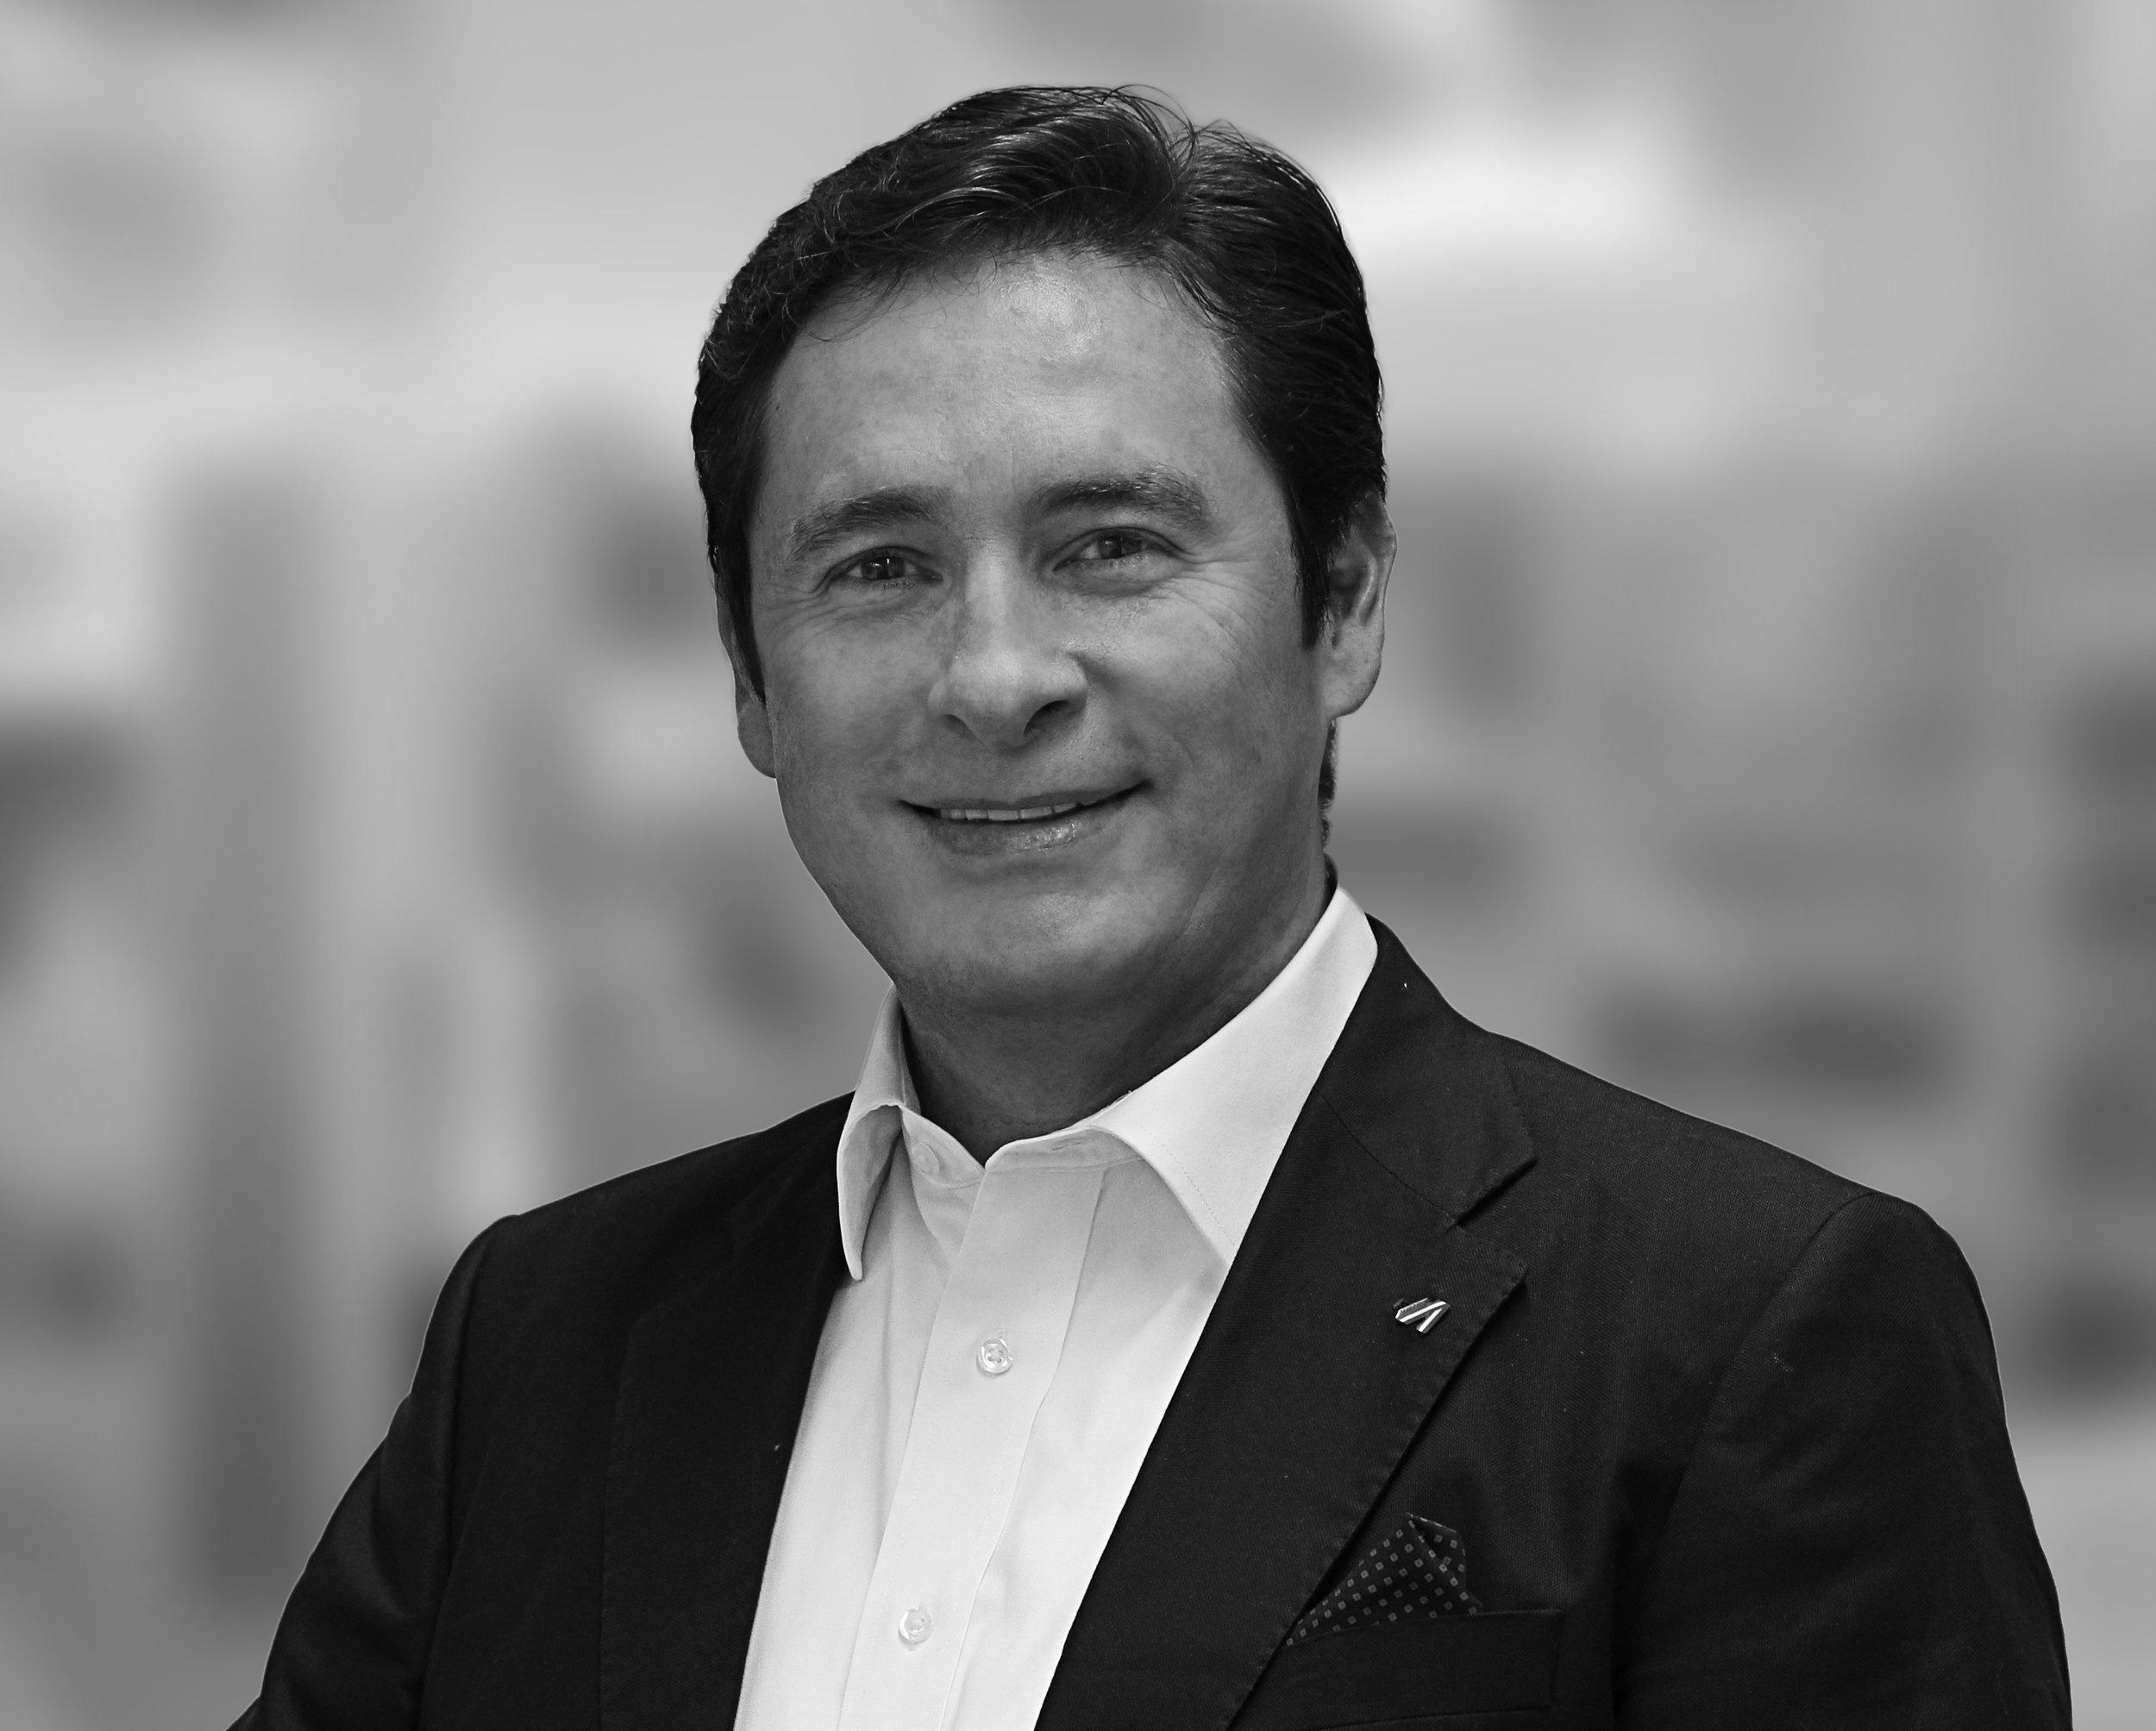 Hector Montellano - Sales & Business Development, Untha Shredding Technology